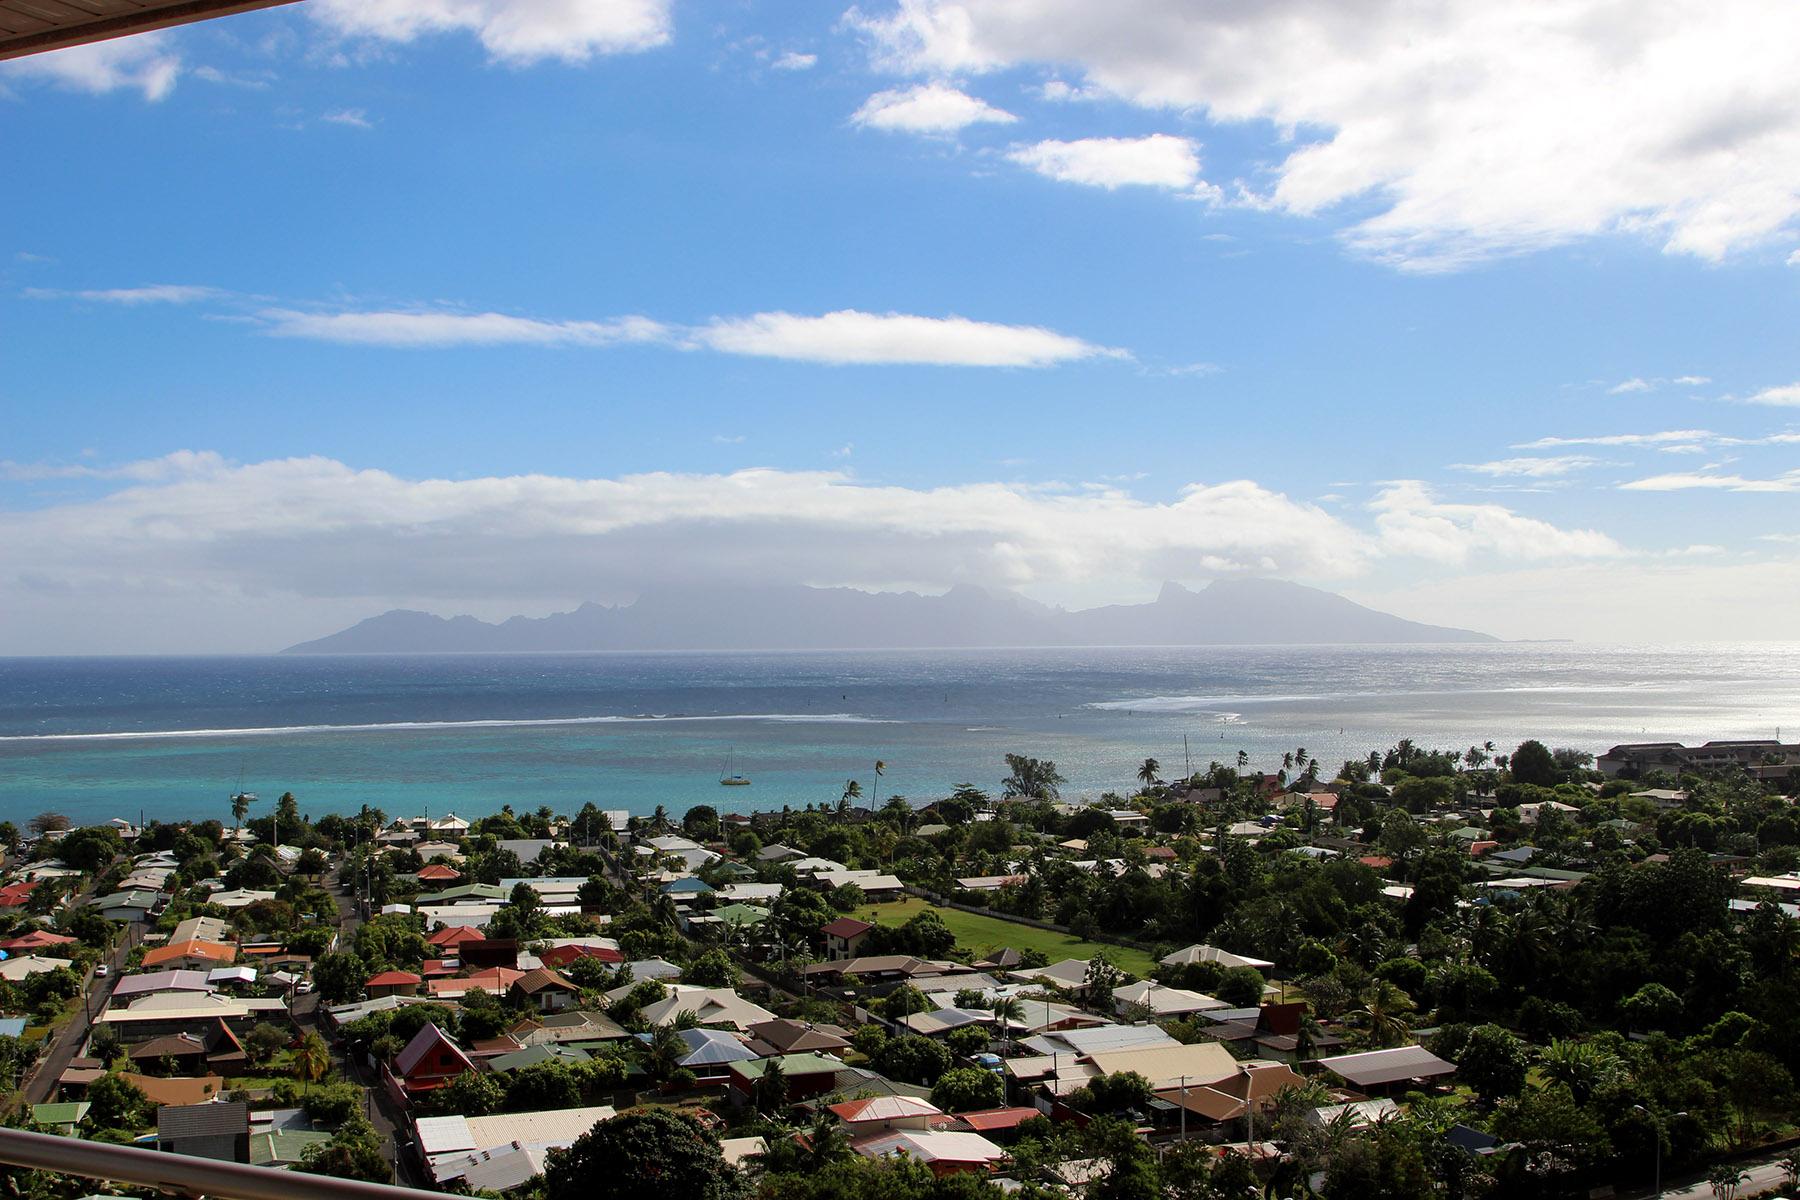 可出售的物业 Tahiti